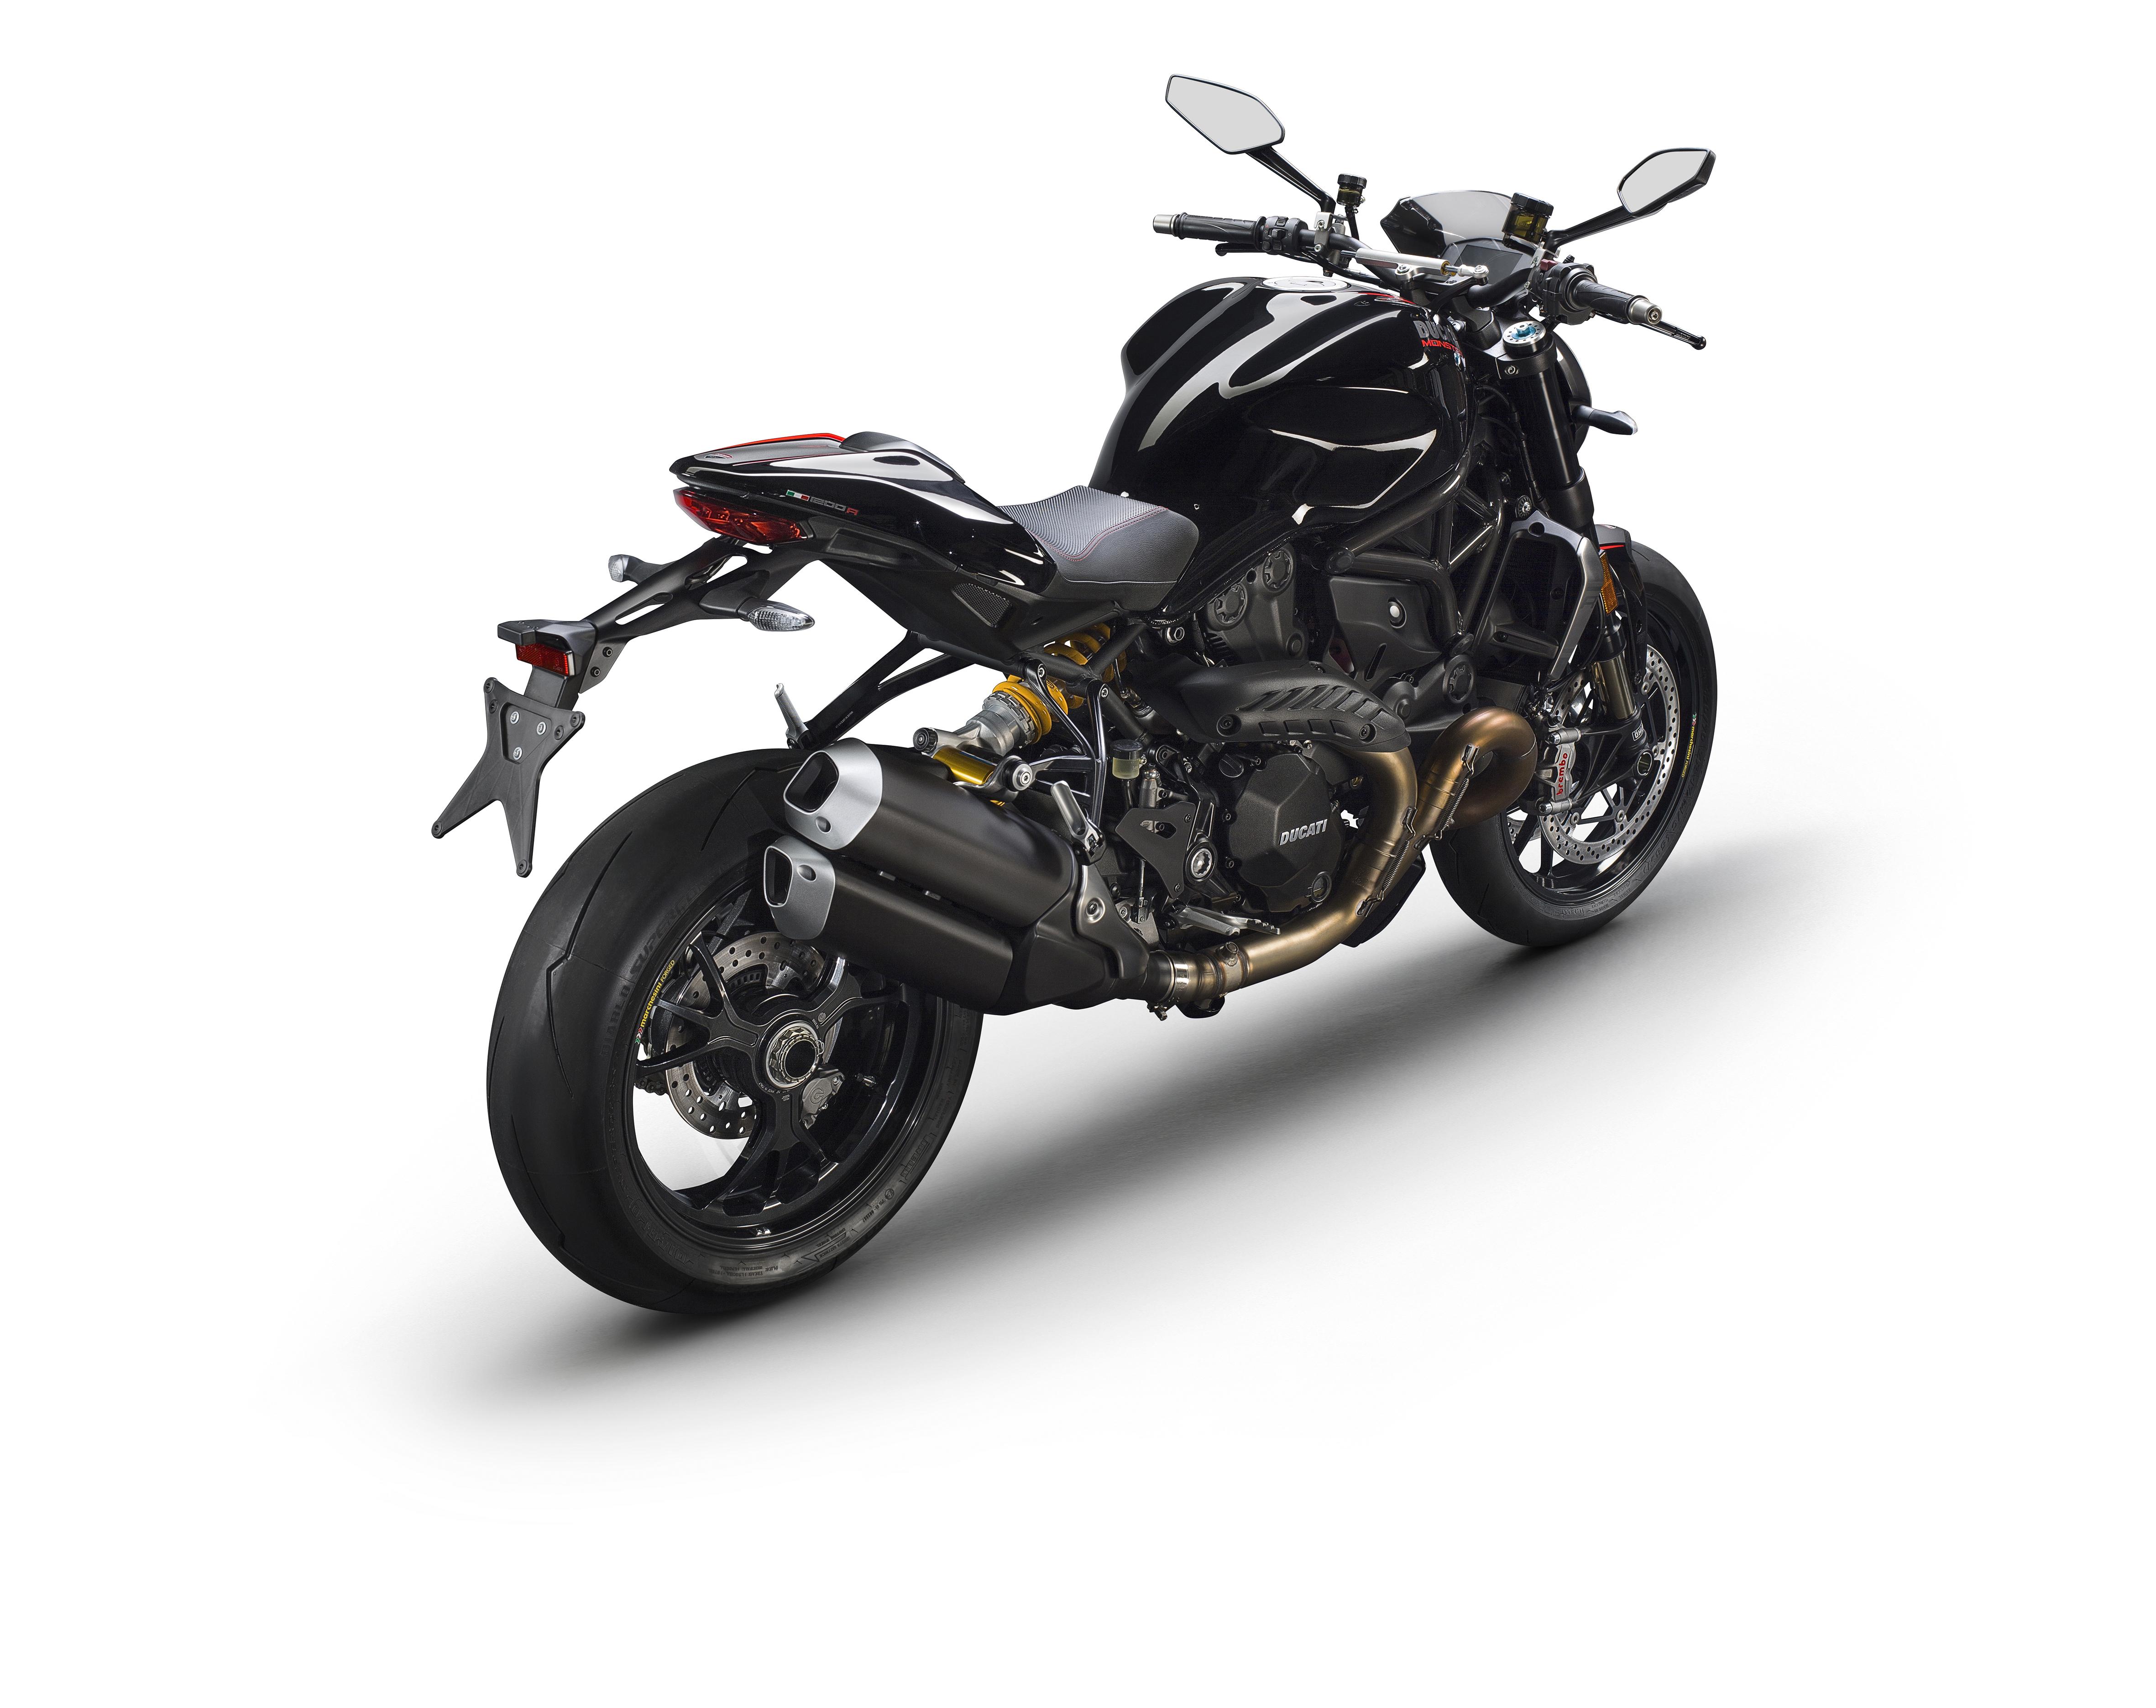 Ducati Monster 1200 S livrea Black on Black - foto - 16/19